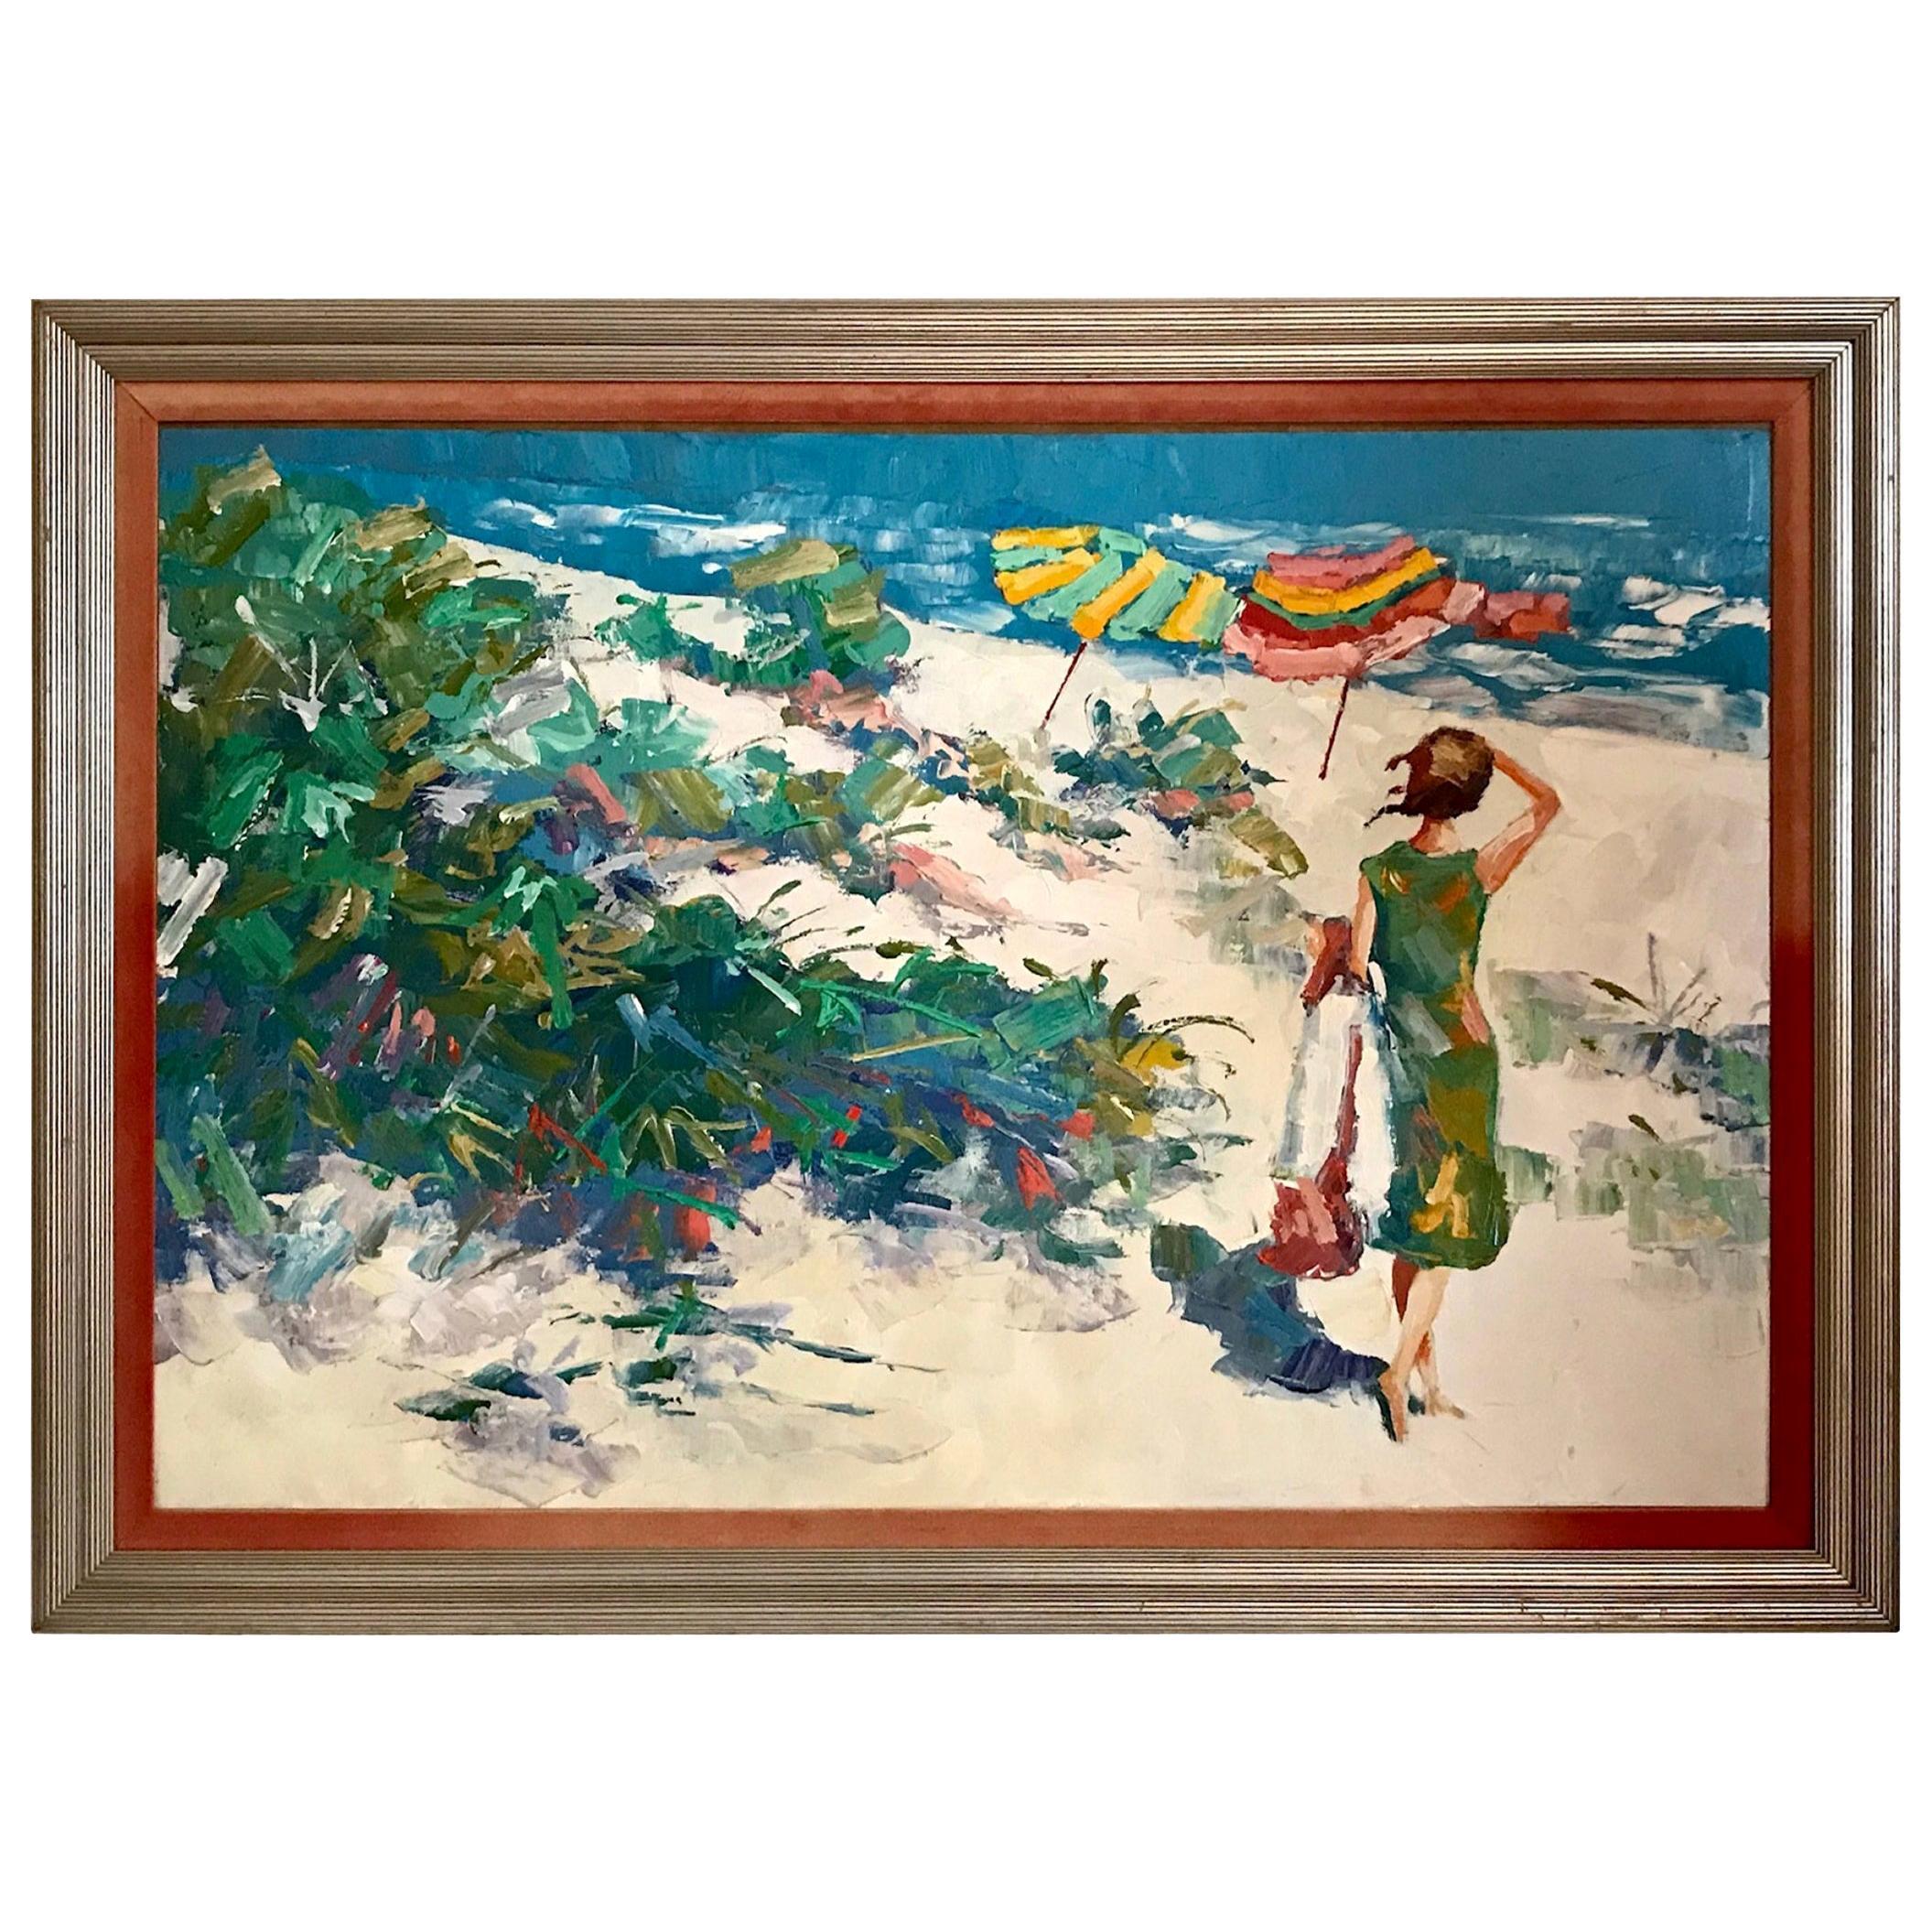 Nicola Simbari after Oil Painting of Figure in Mediterranean Landscape